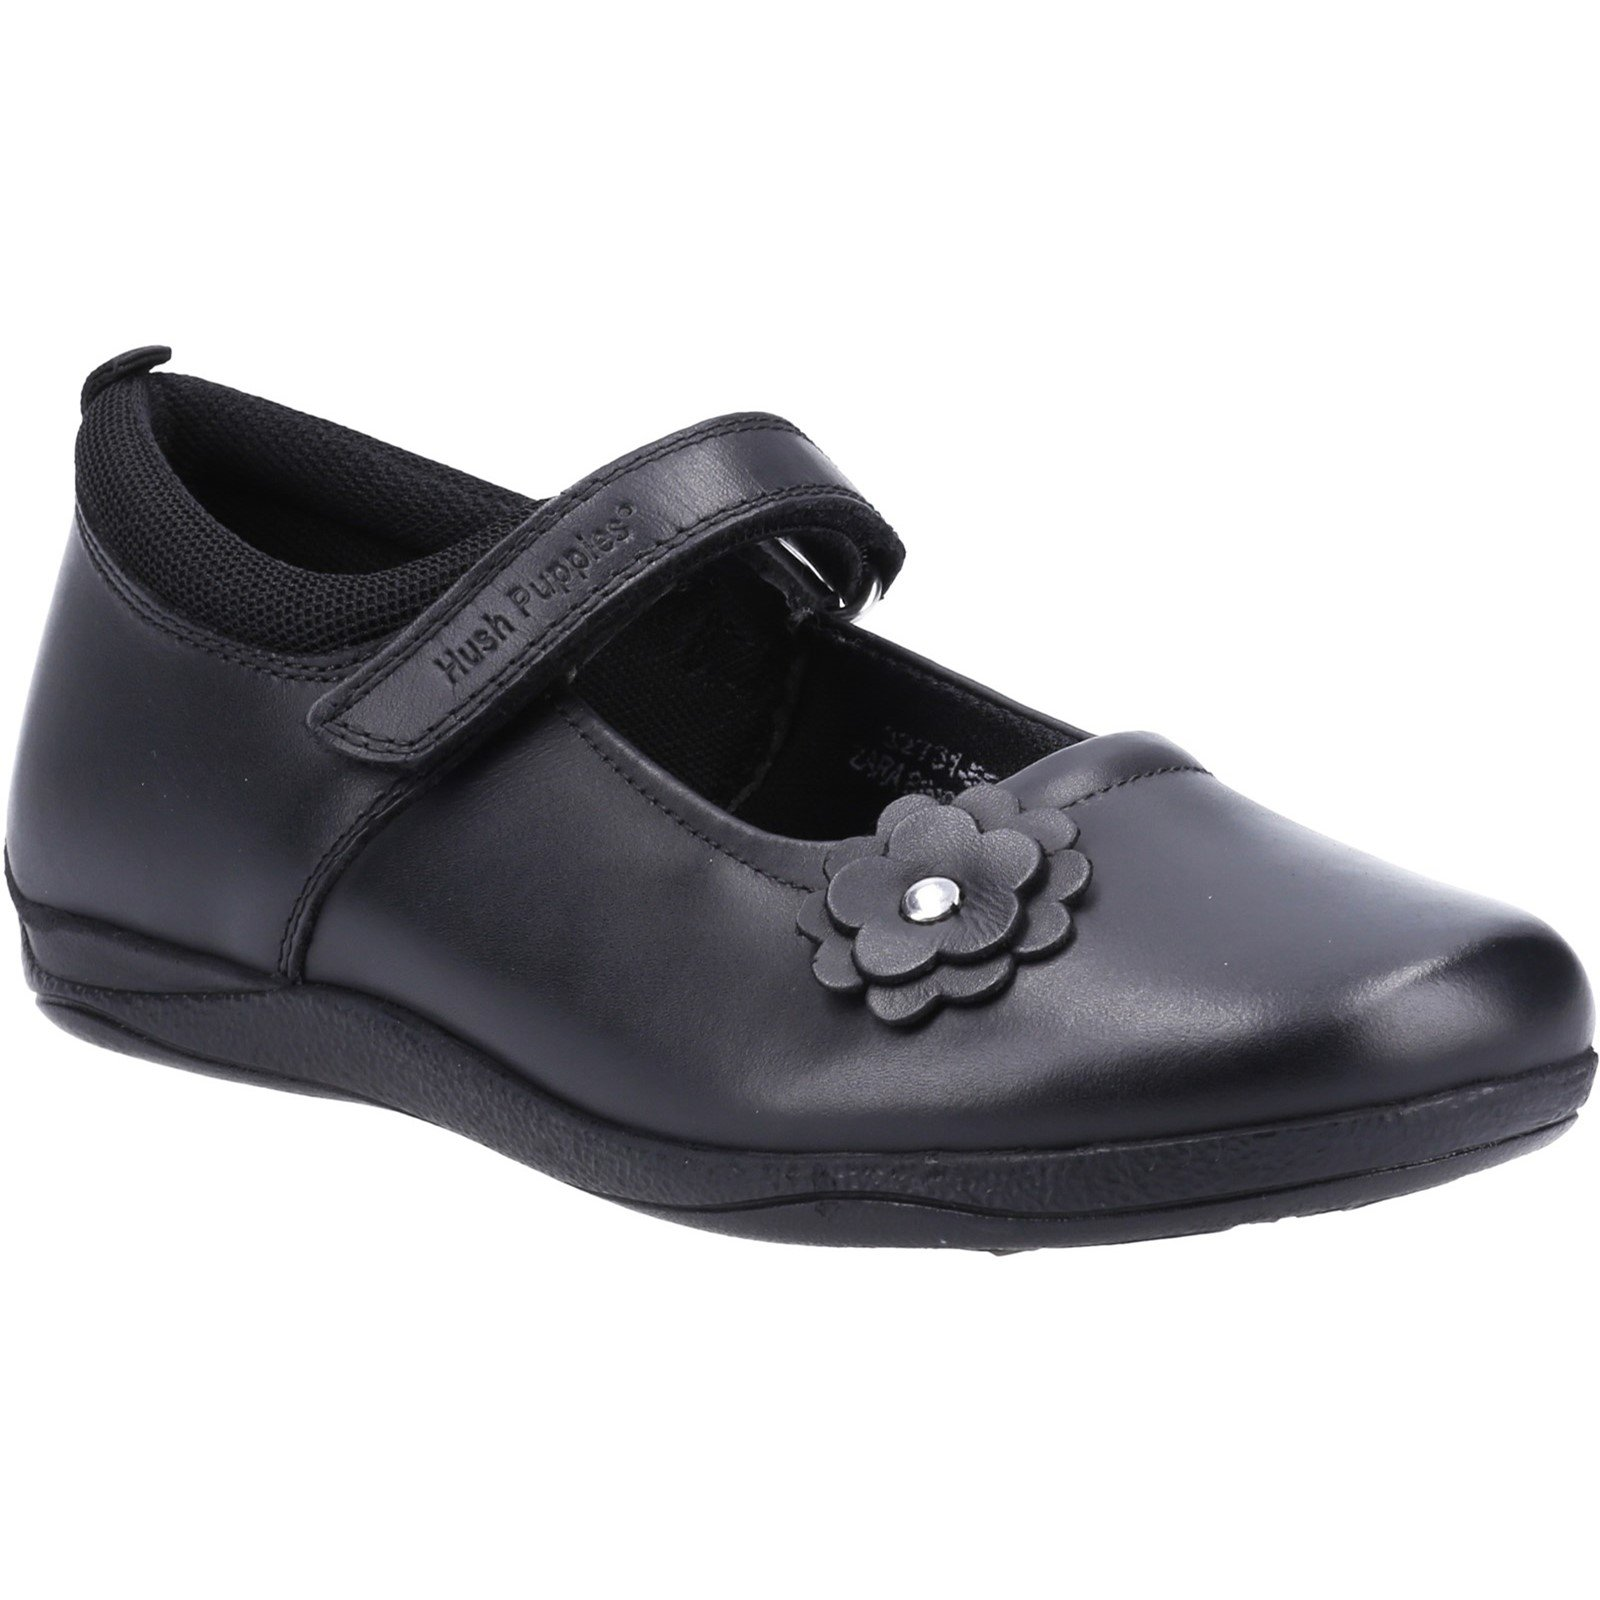 Hush Puppies Kid's Zara Senior School Flat Shoe Black 32732 - Black 5